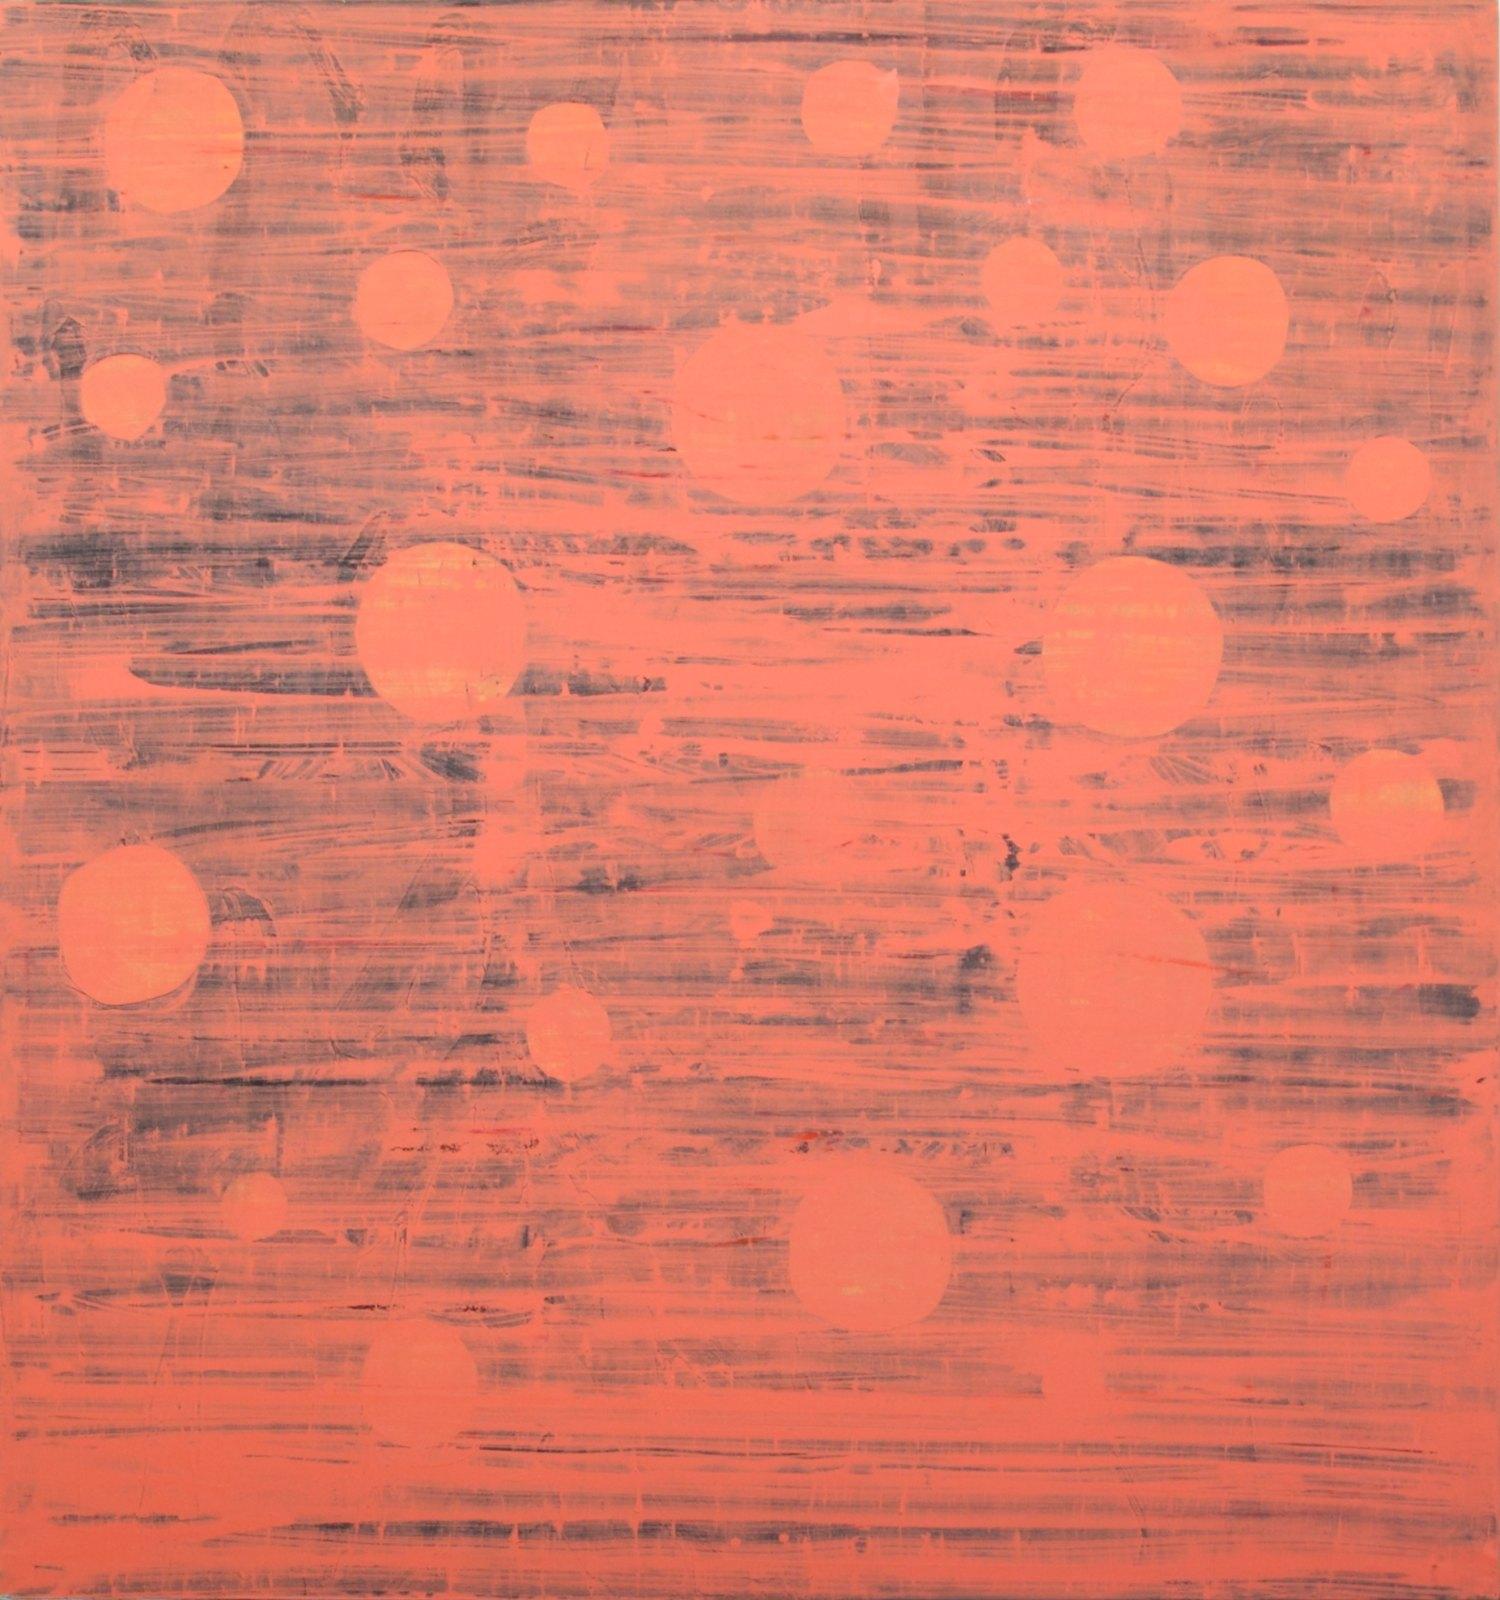 Olav Christopher Jenssen, Lack of Memory/Language, 1991-92, Oil on canvas, 275 x 255 cm